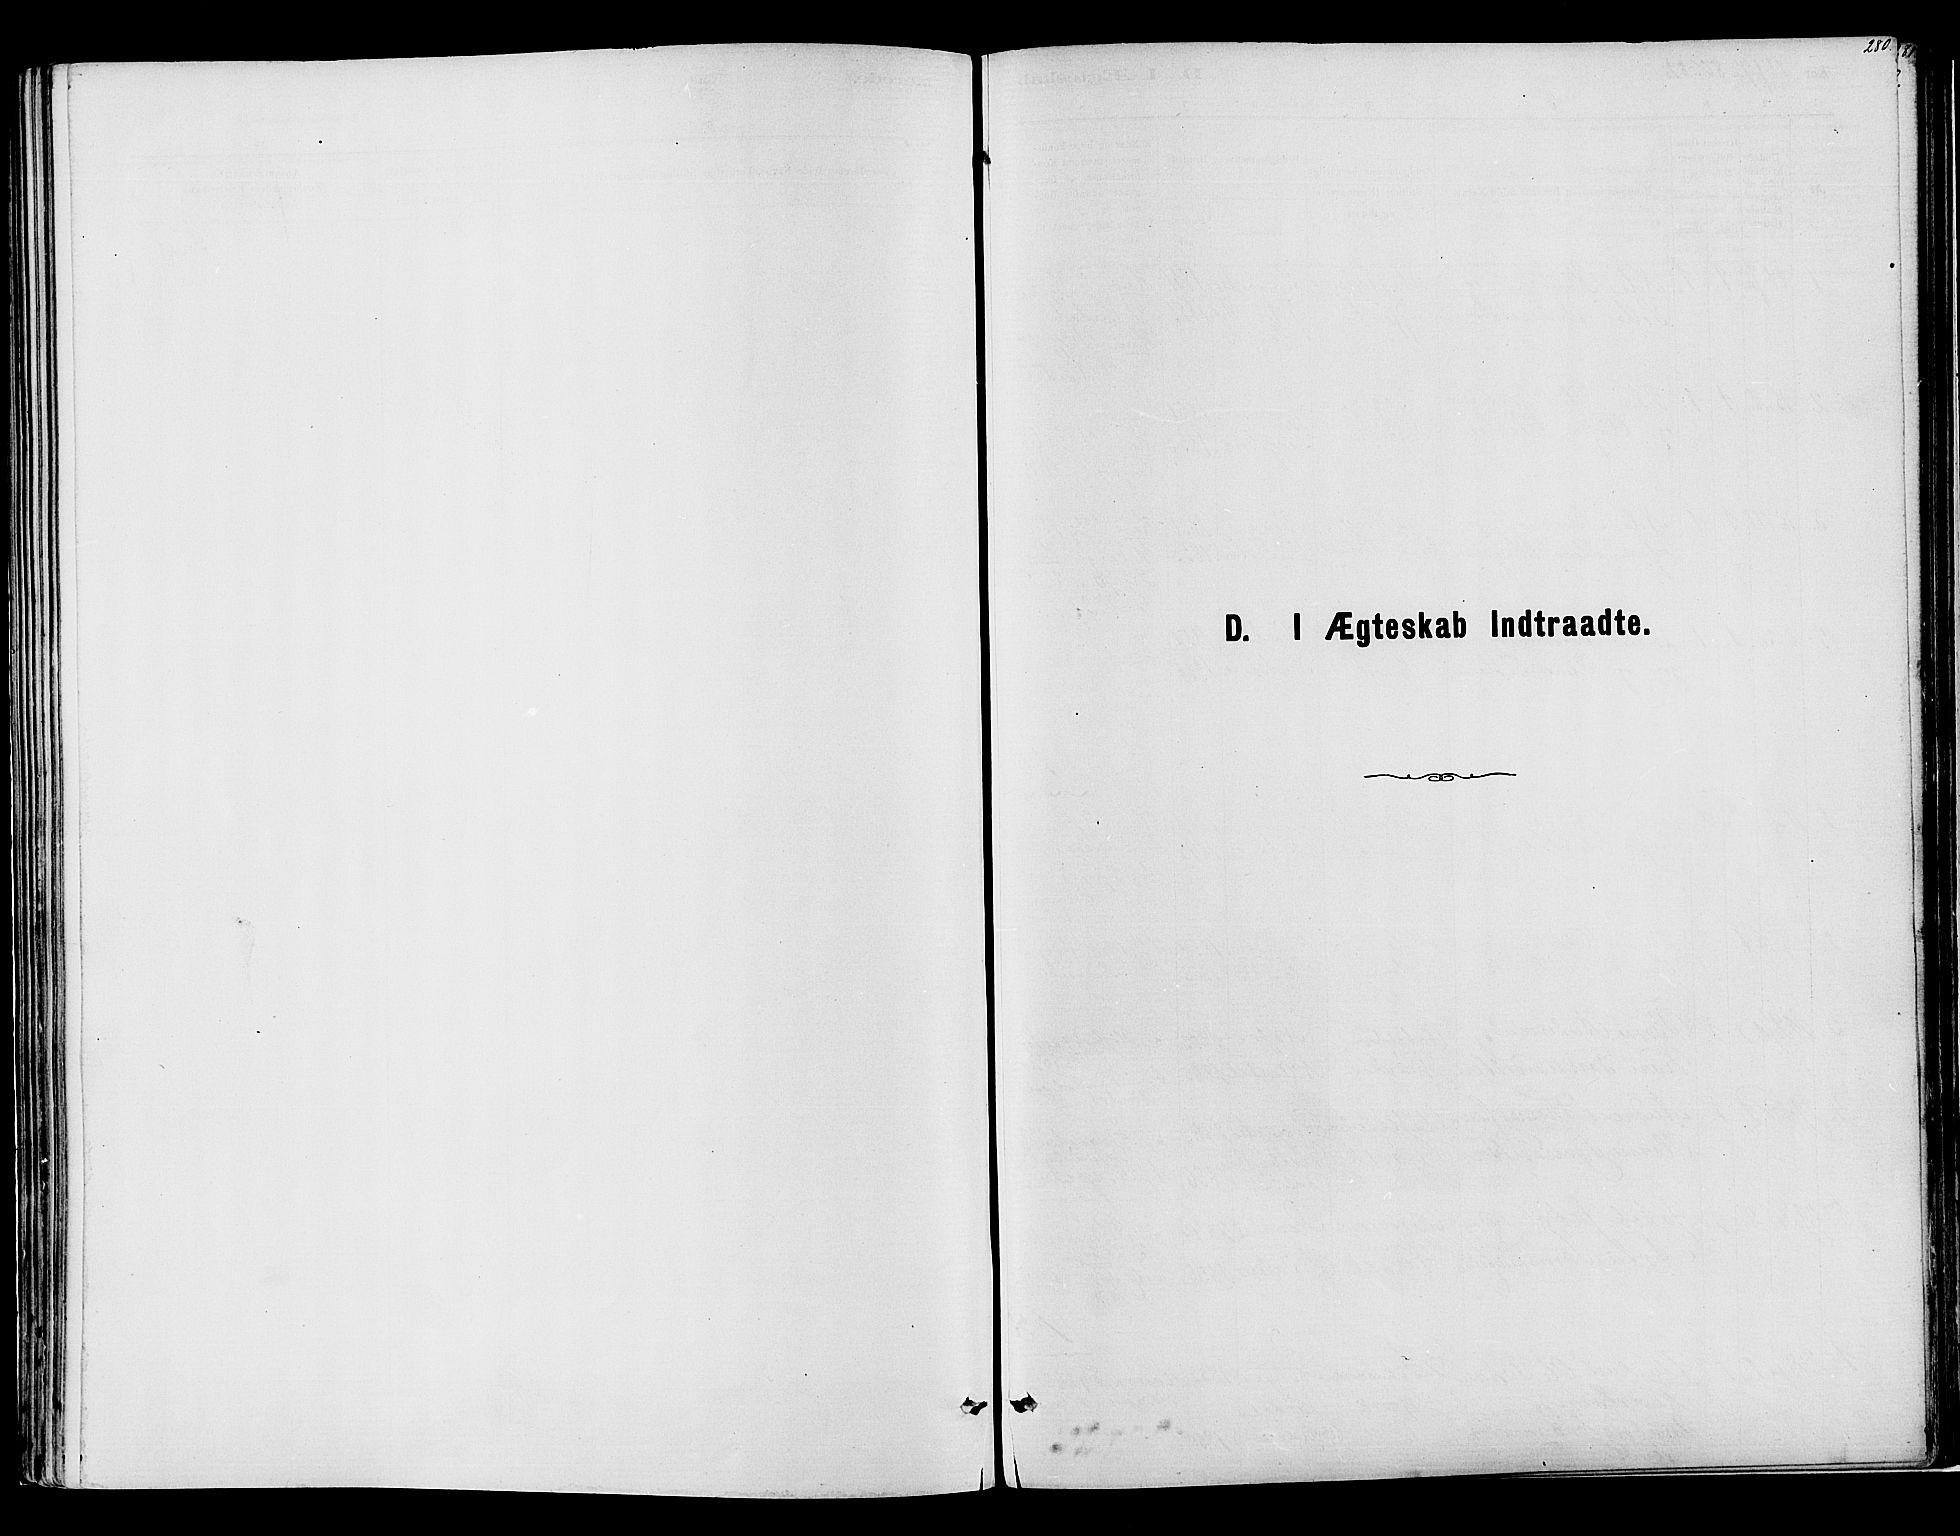 SAH, Vardal prestekontor, H/Ha/Haa/L0008: Ministerialbok nr. 8, 1878-1890, s. 280